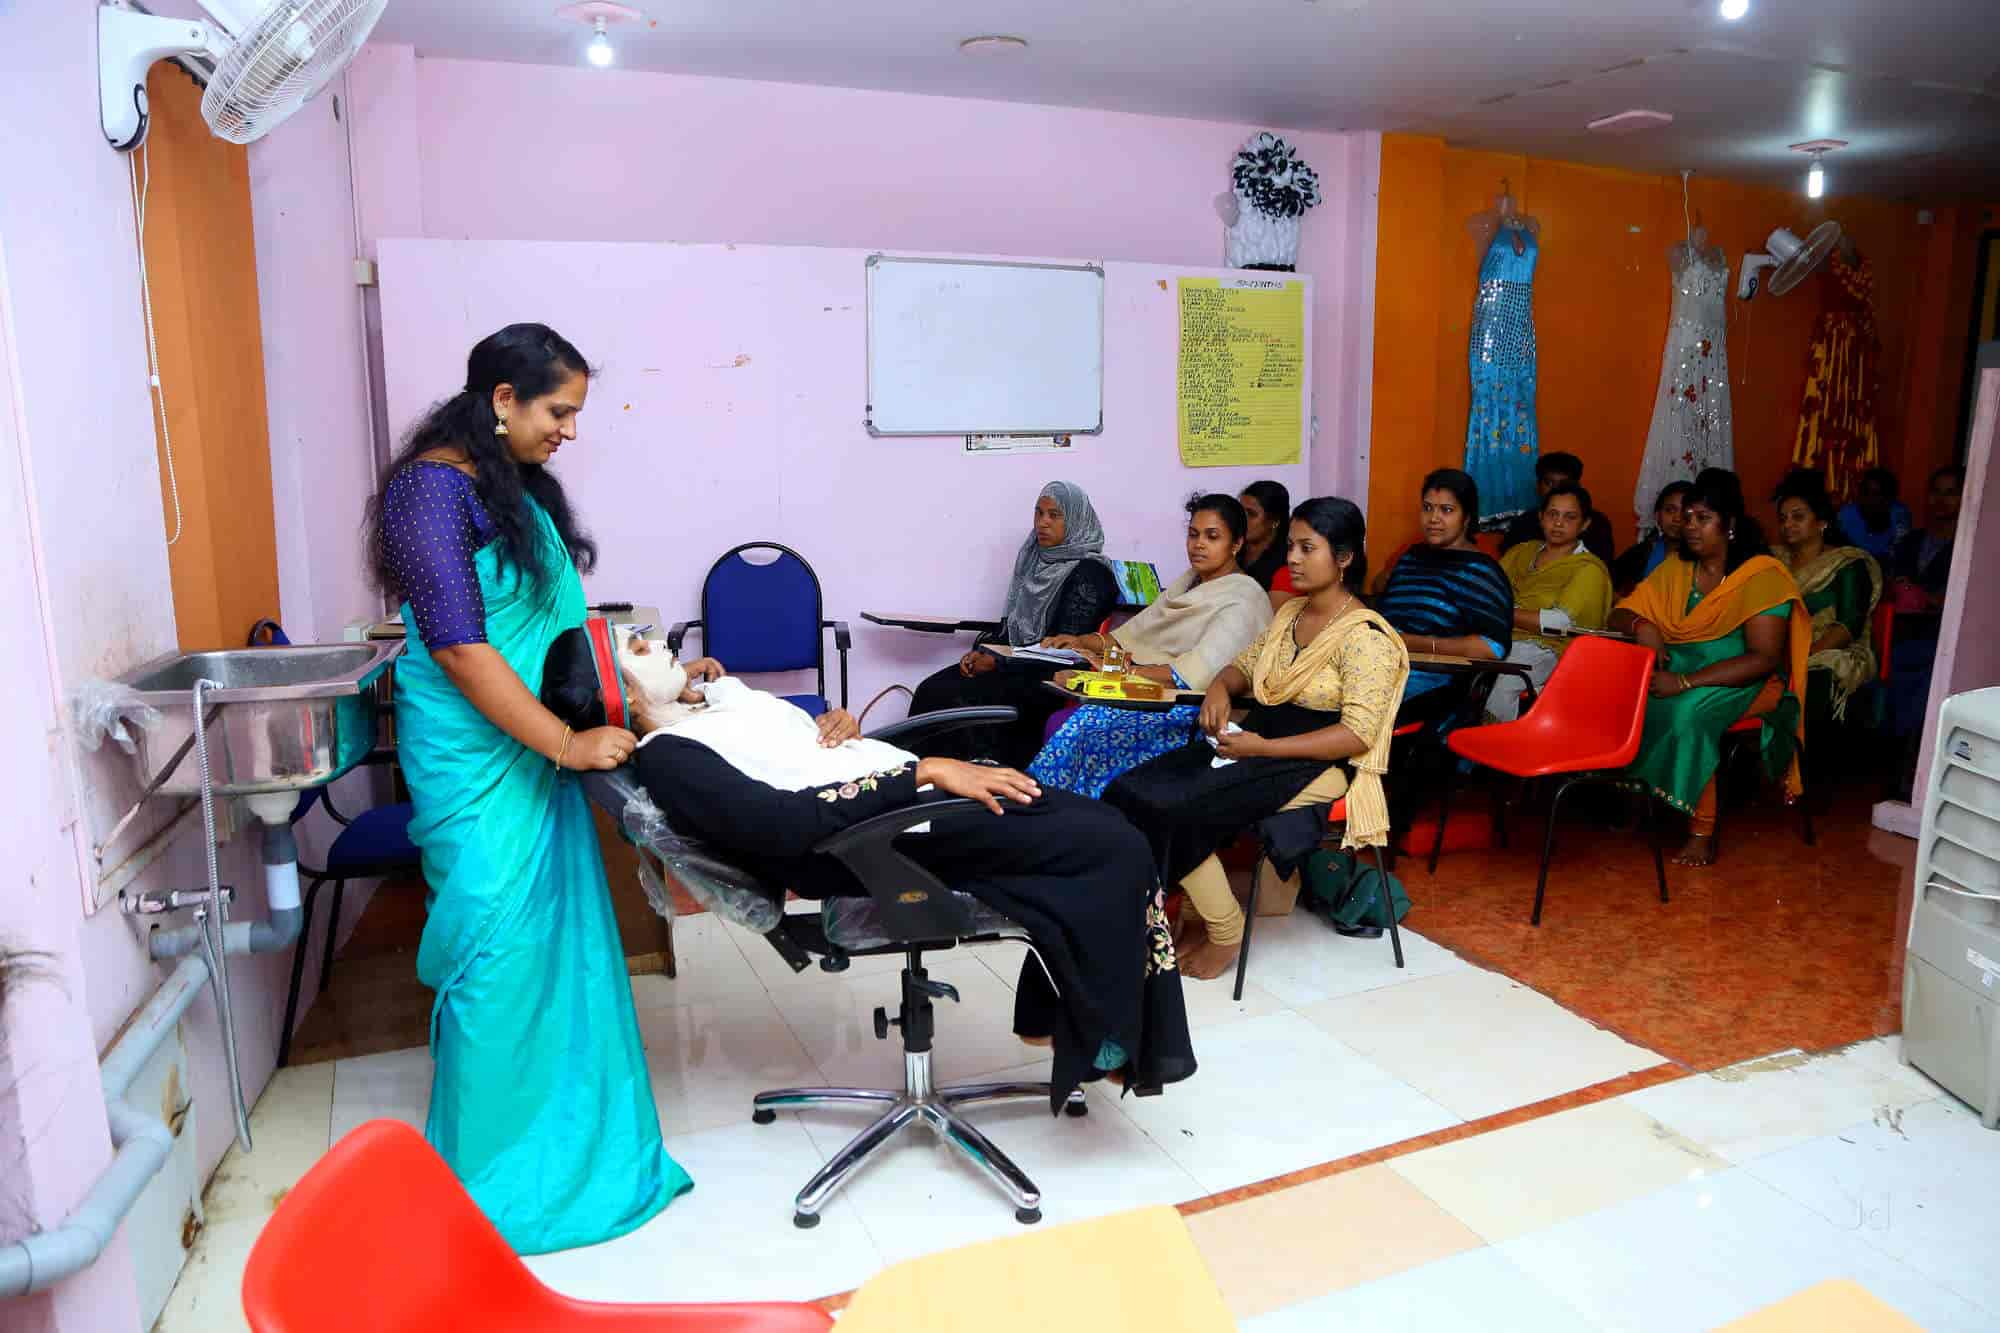 Diwani School Of Fashion Designing Kothamangalam Beautician Institutes In Ernakulam Justdial